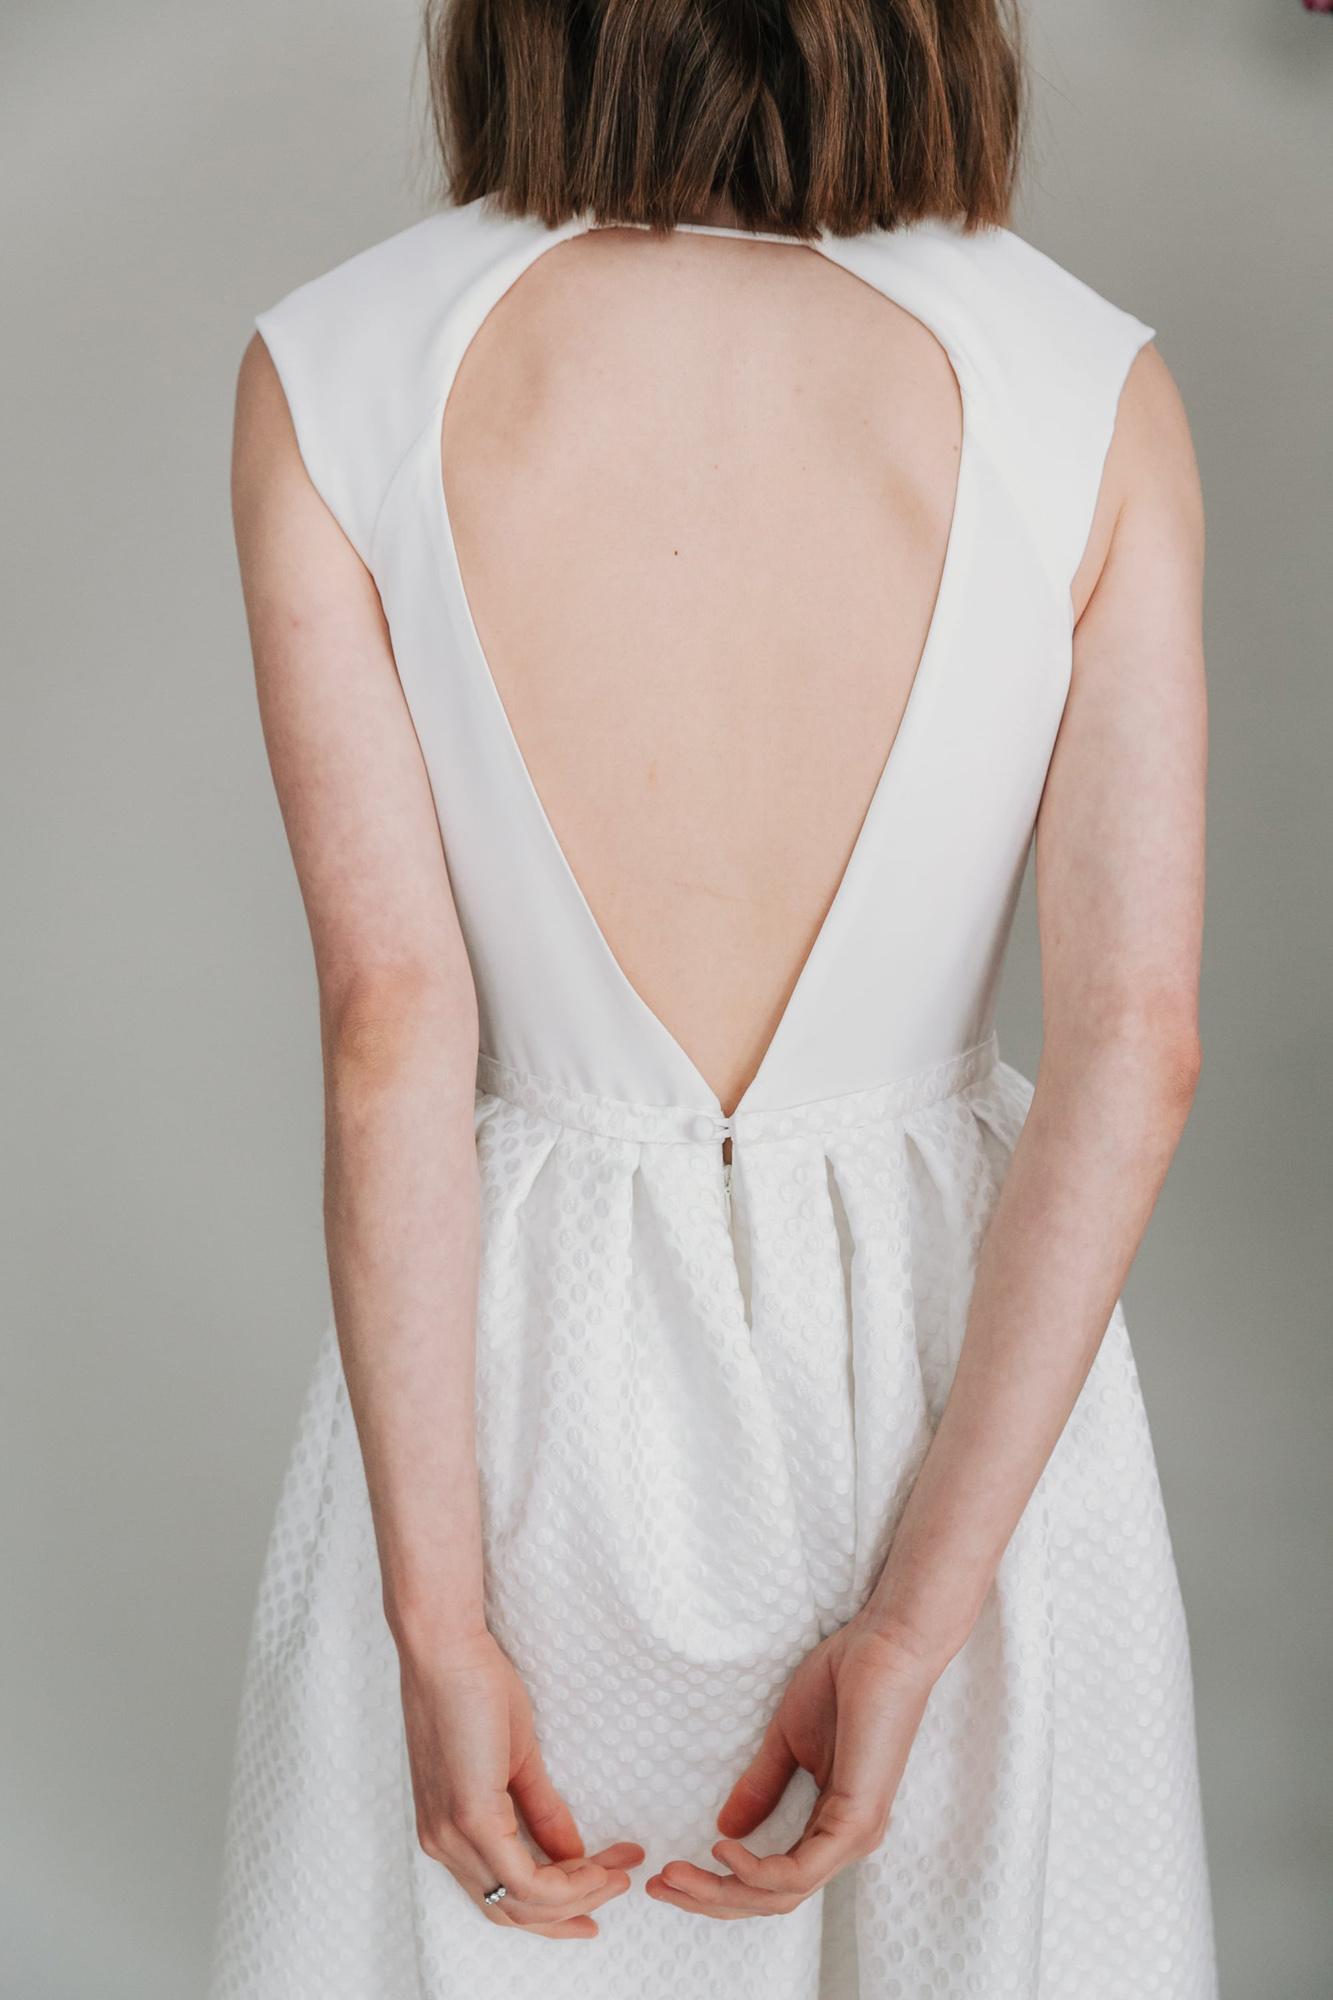 Kate-Beaumont-Sheffield-Zinnia-Modern-Wedding-Gown-Polka-Dot-Pleated-Skirt-10.jpg